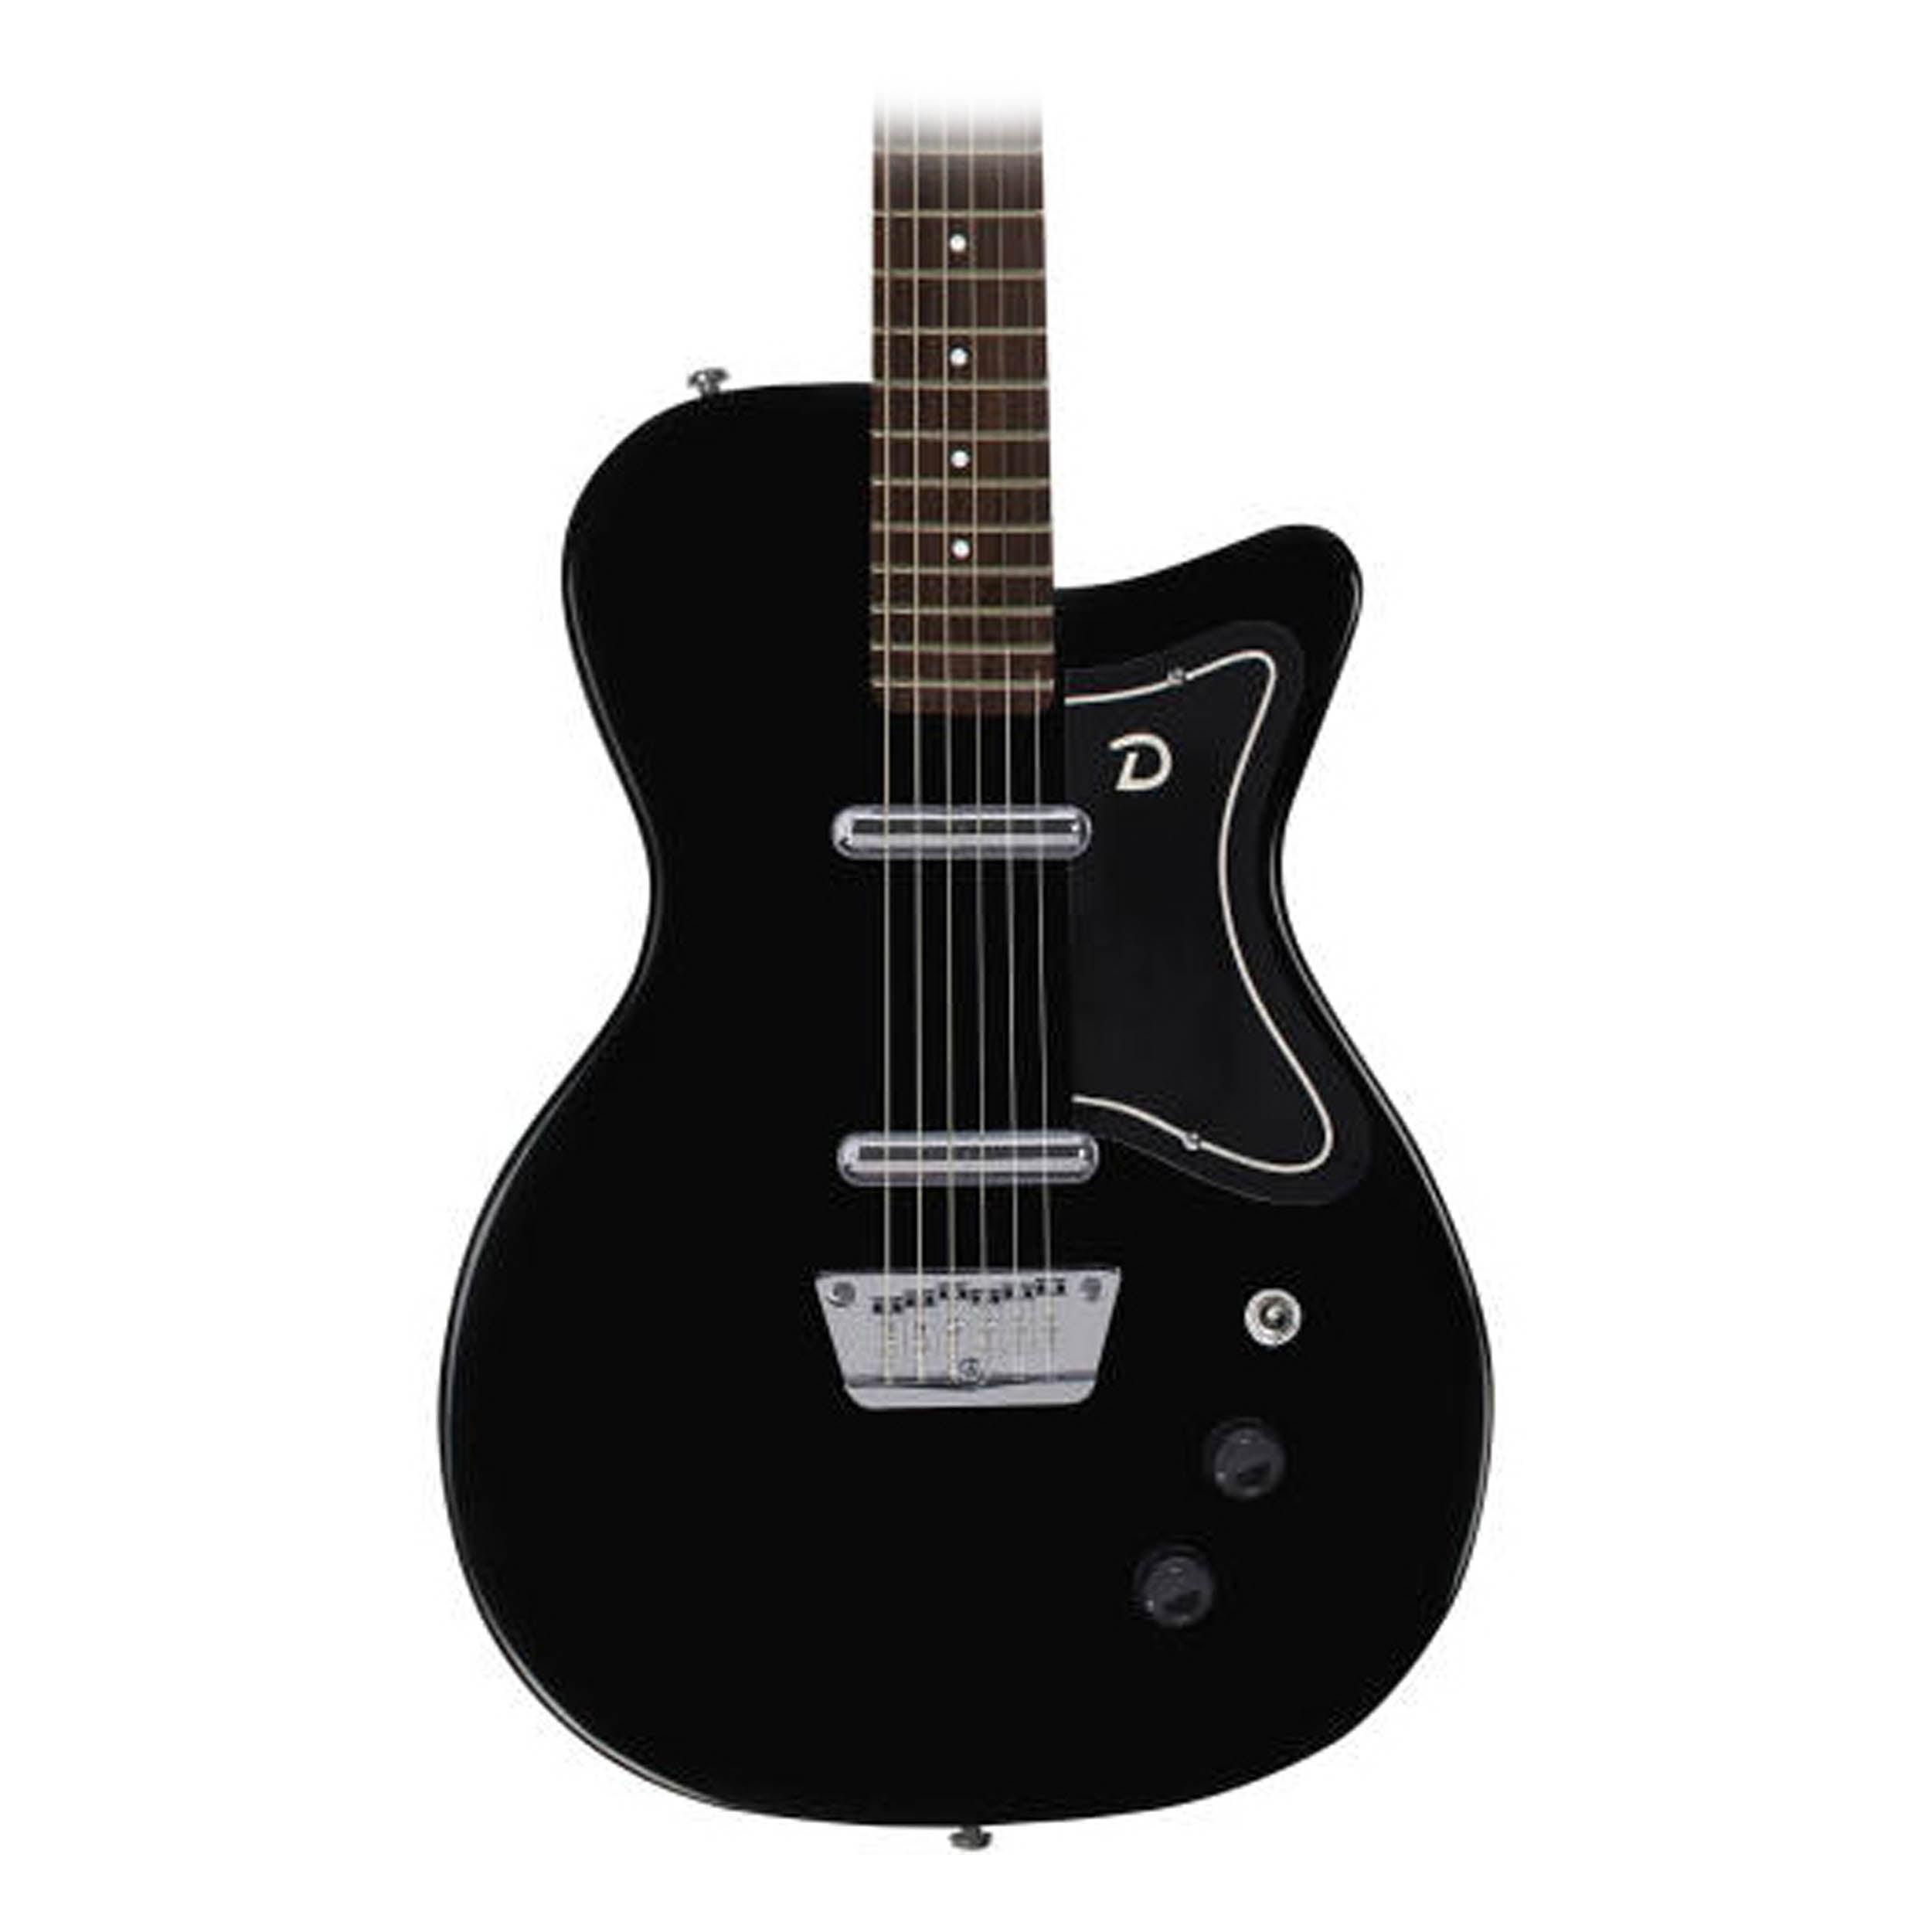 Danelectro '56 Baritone Black Guitar by Danelectro